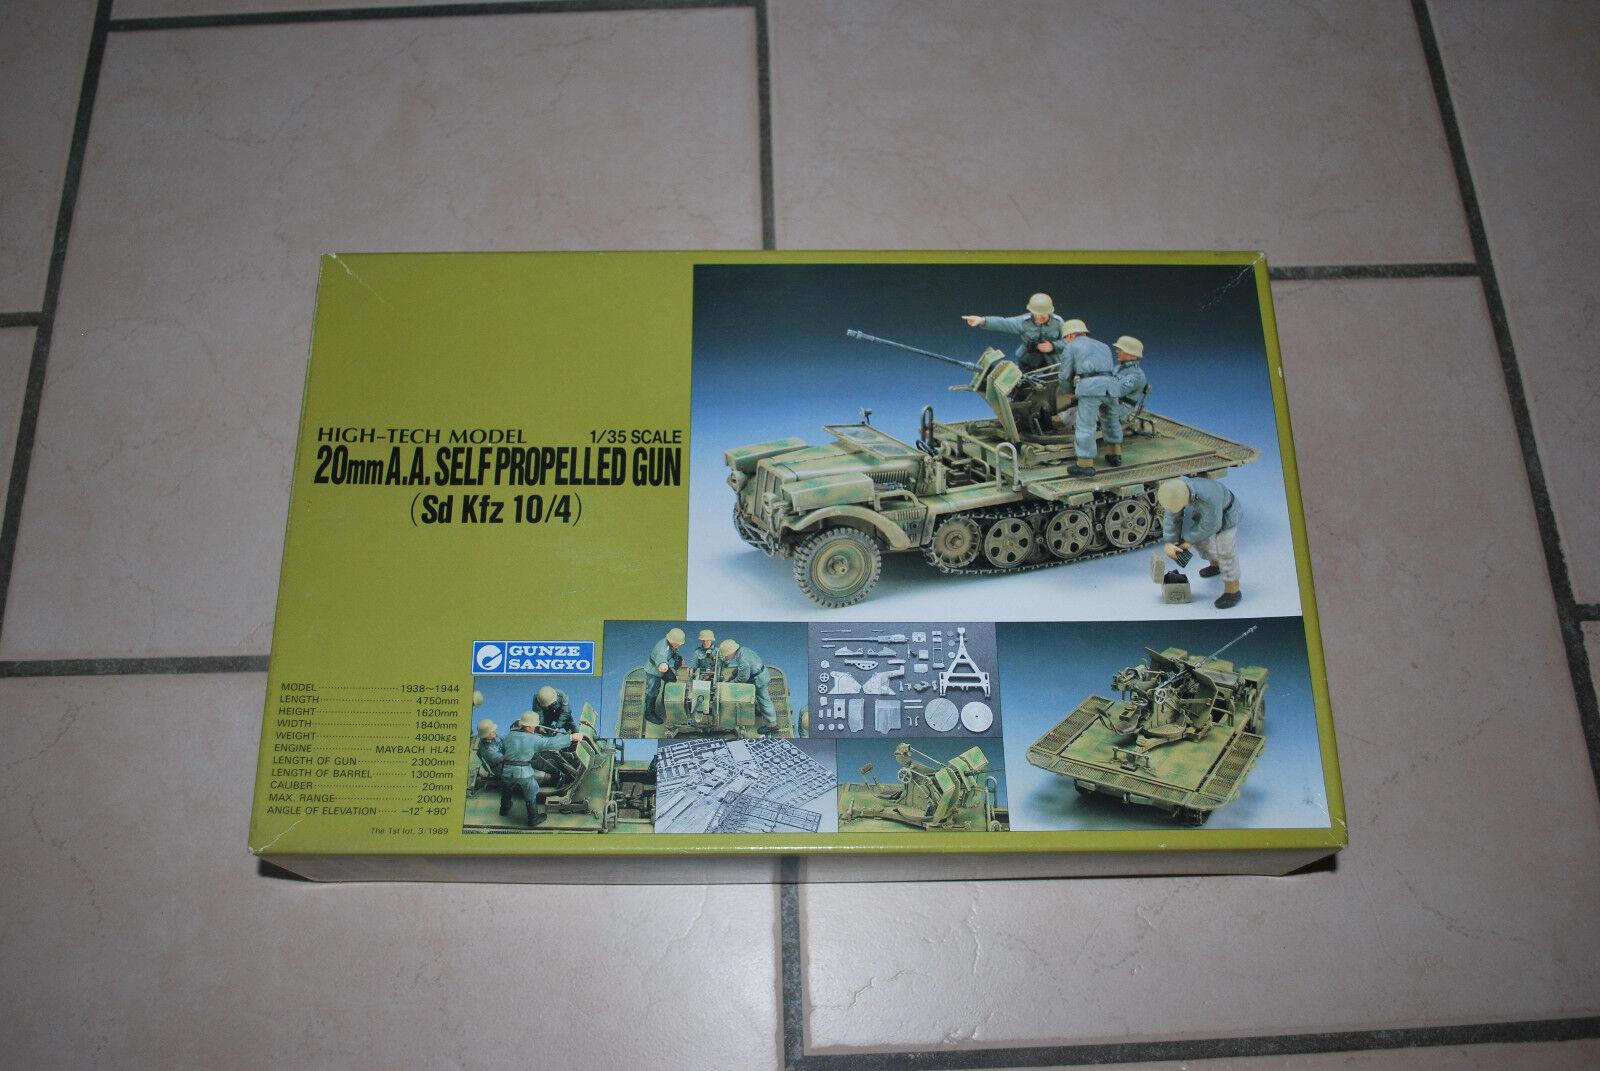 1 35 Gunze Sangyo High Tech Model Sd.Kfz 10 4, 20mm Gun, RAR, Weiß metal, PE